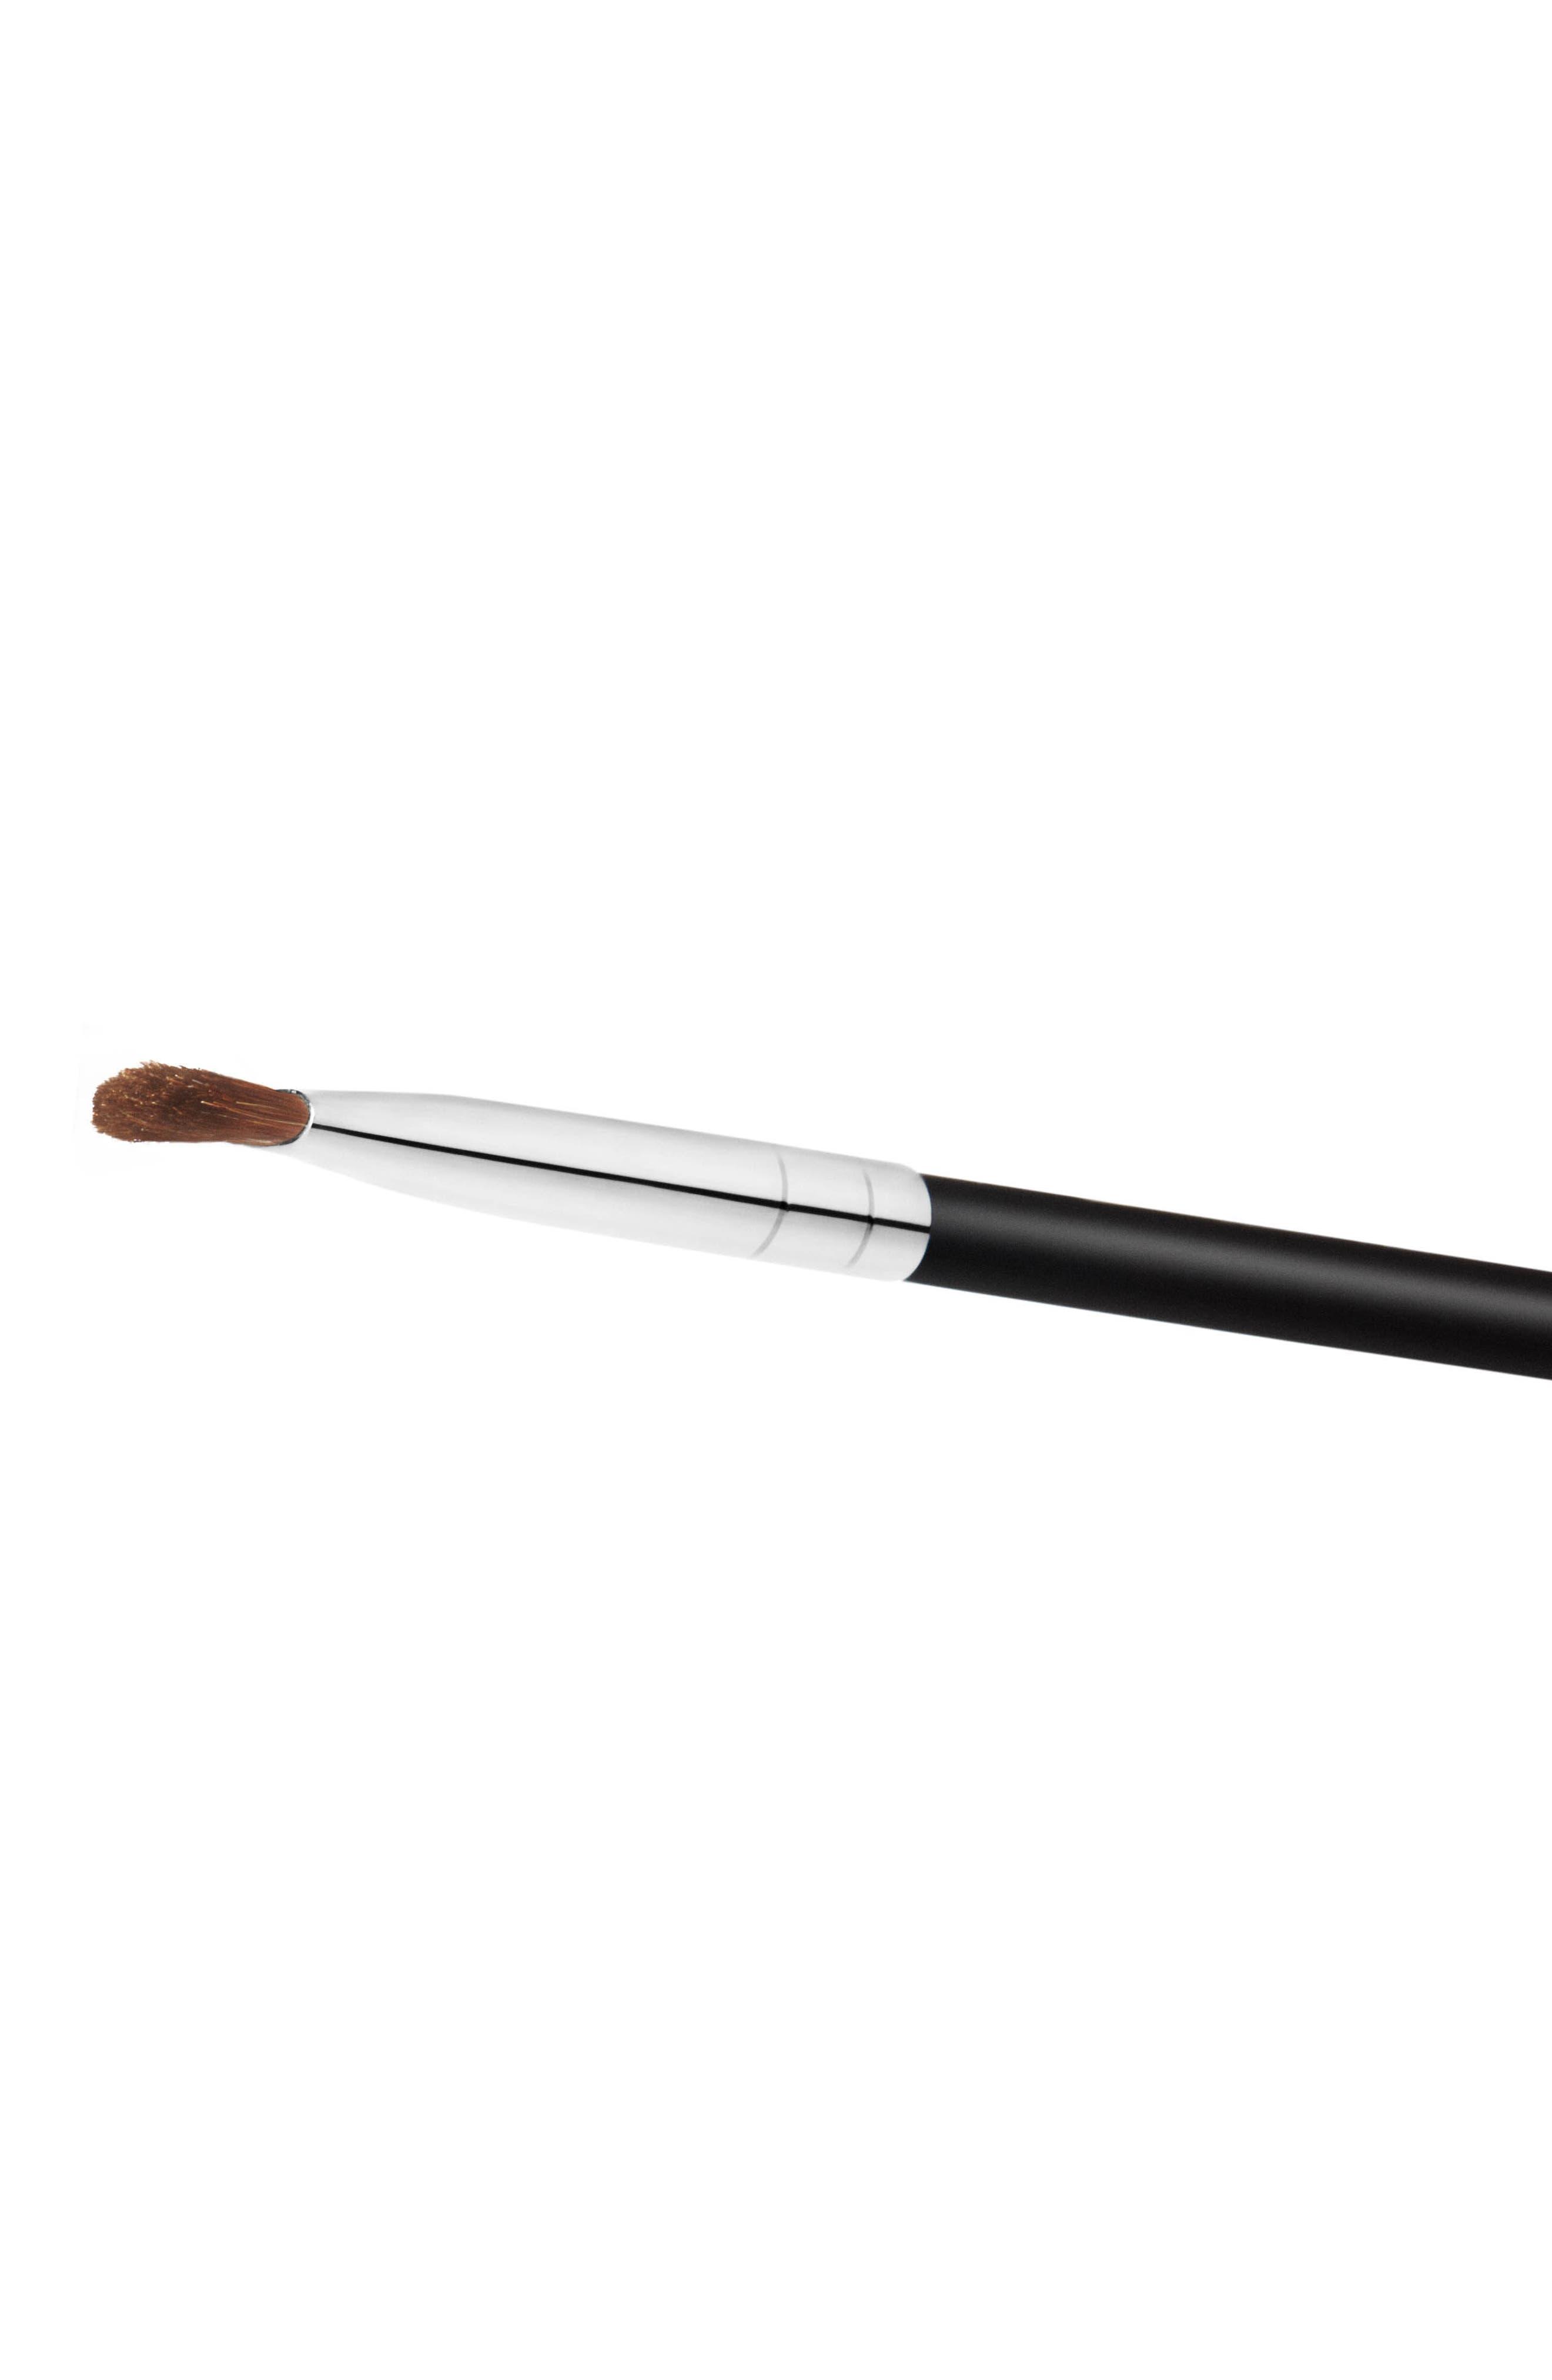 MAC 228 Synthetic Mini Shader Brush,                             Alternate thumbnail 2, color,                             NO COLOR